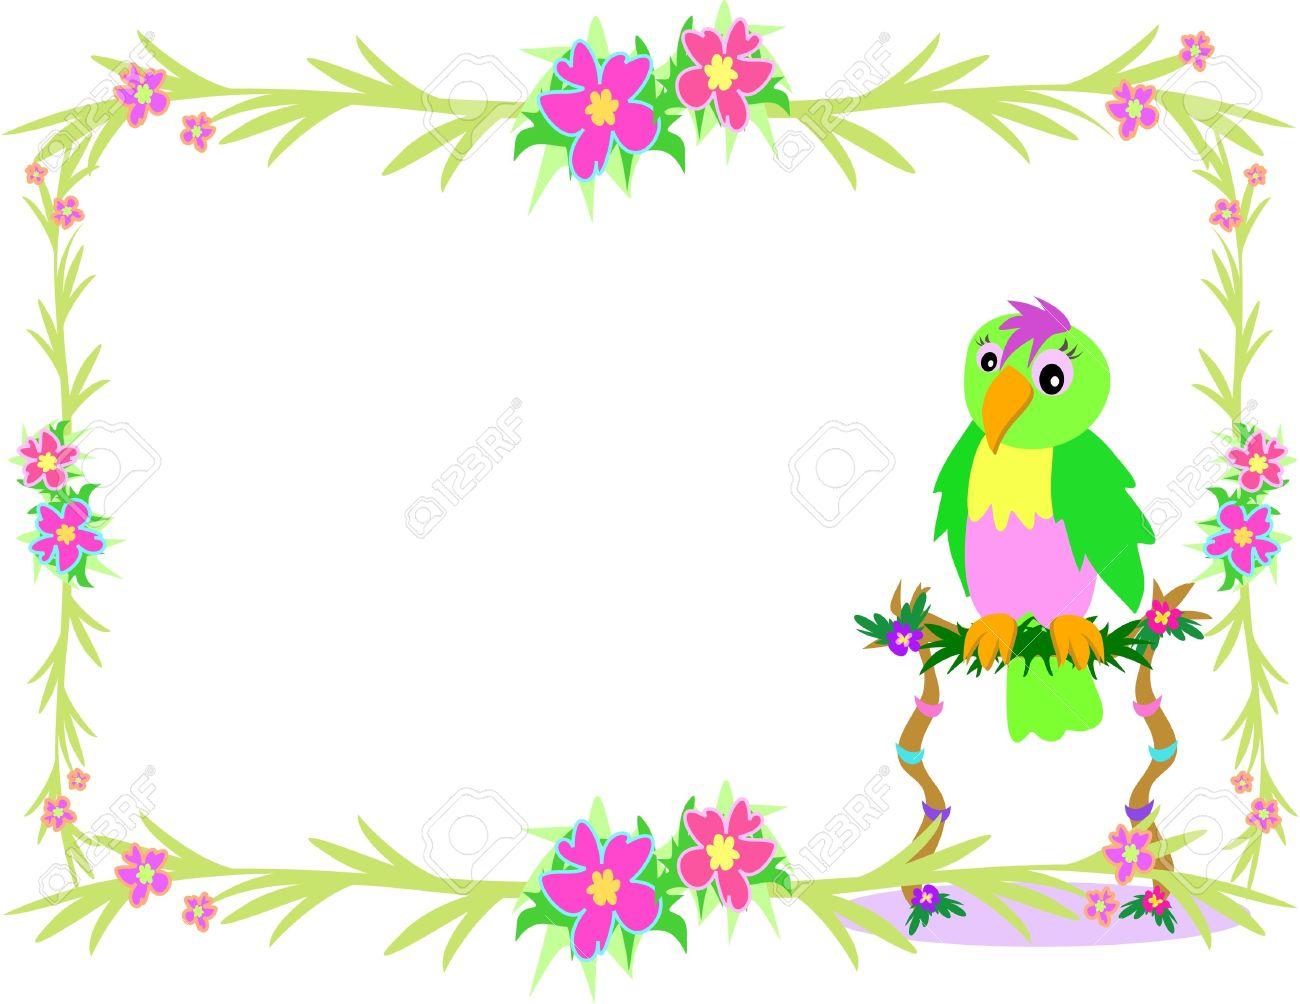 Tropical Parrot Border Clipart.